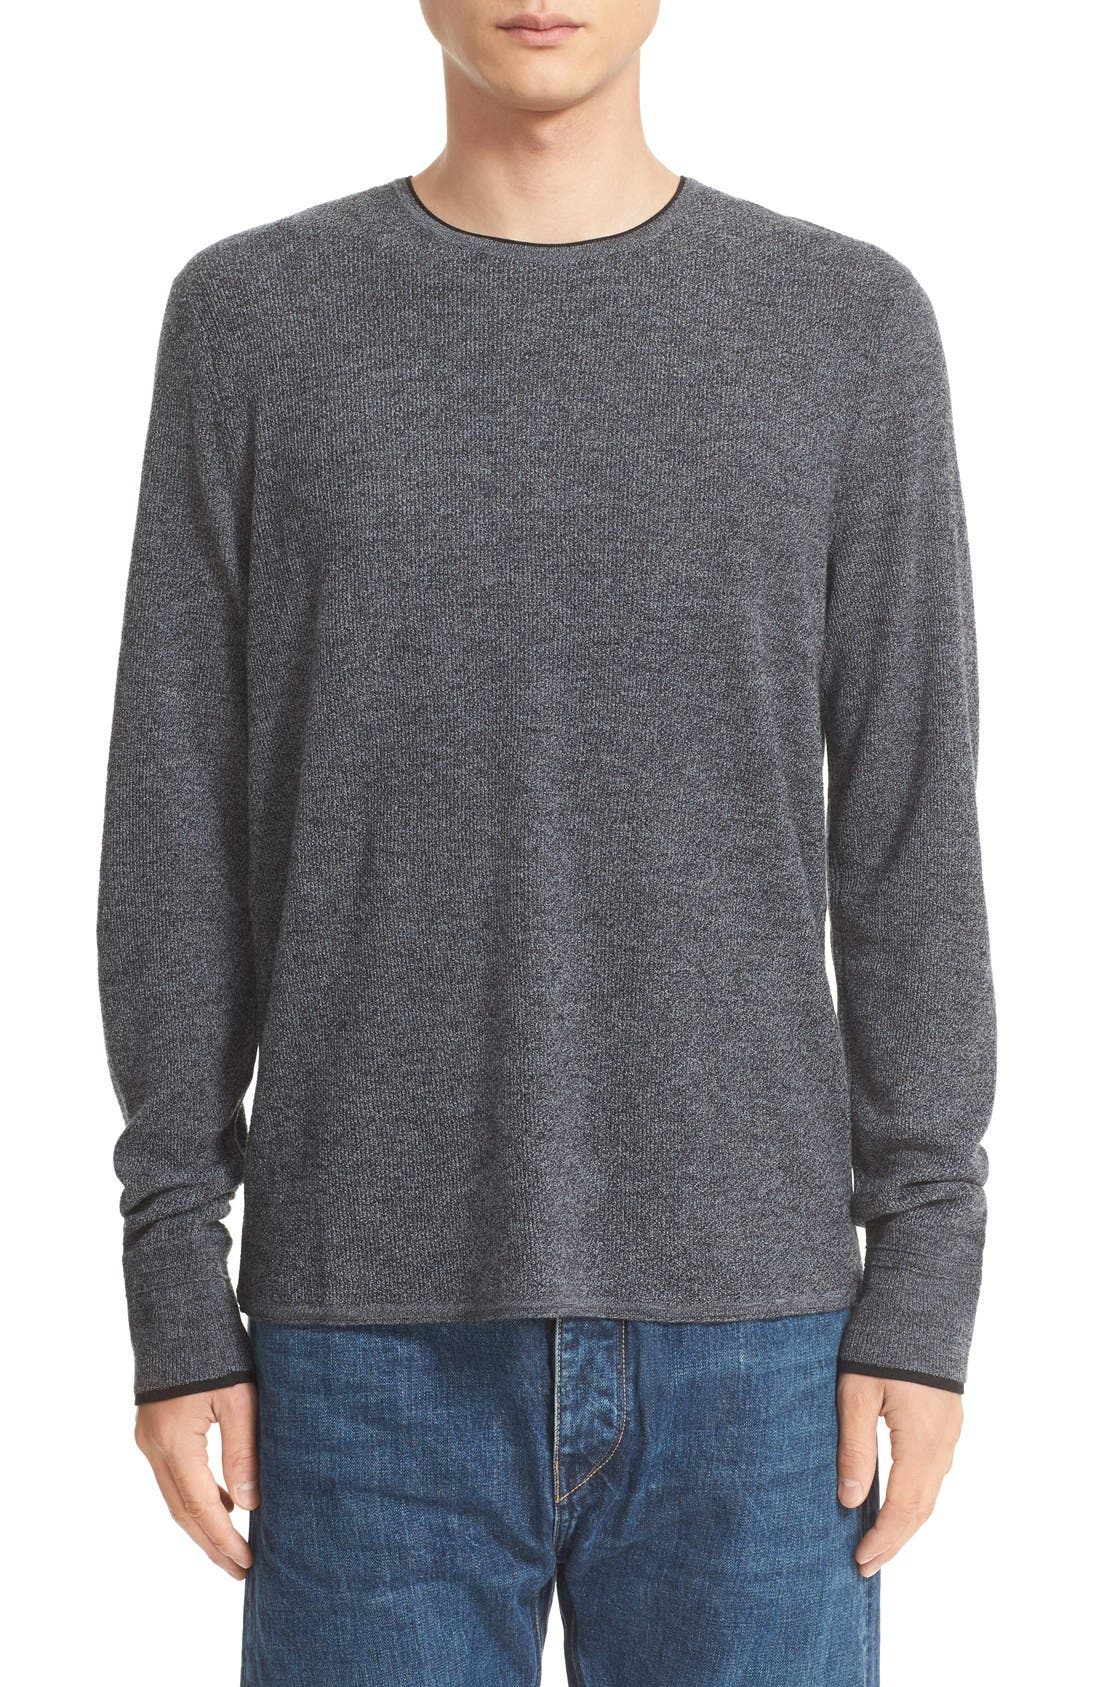 rag & bone 'Giles' Lightweight Merino Wool Pullover